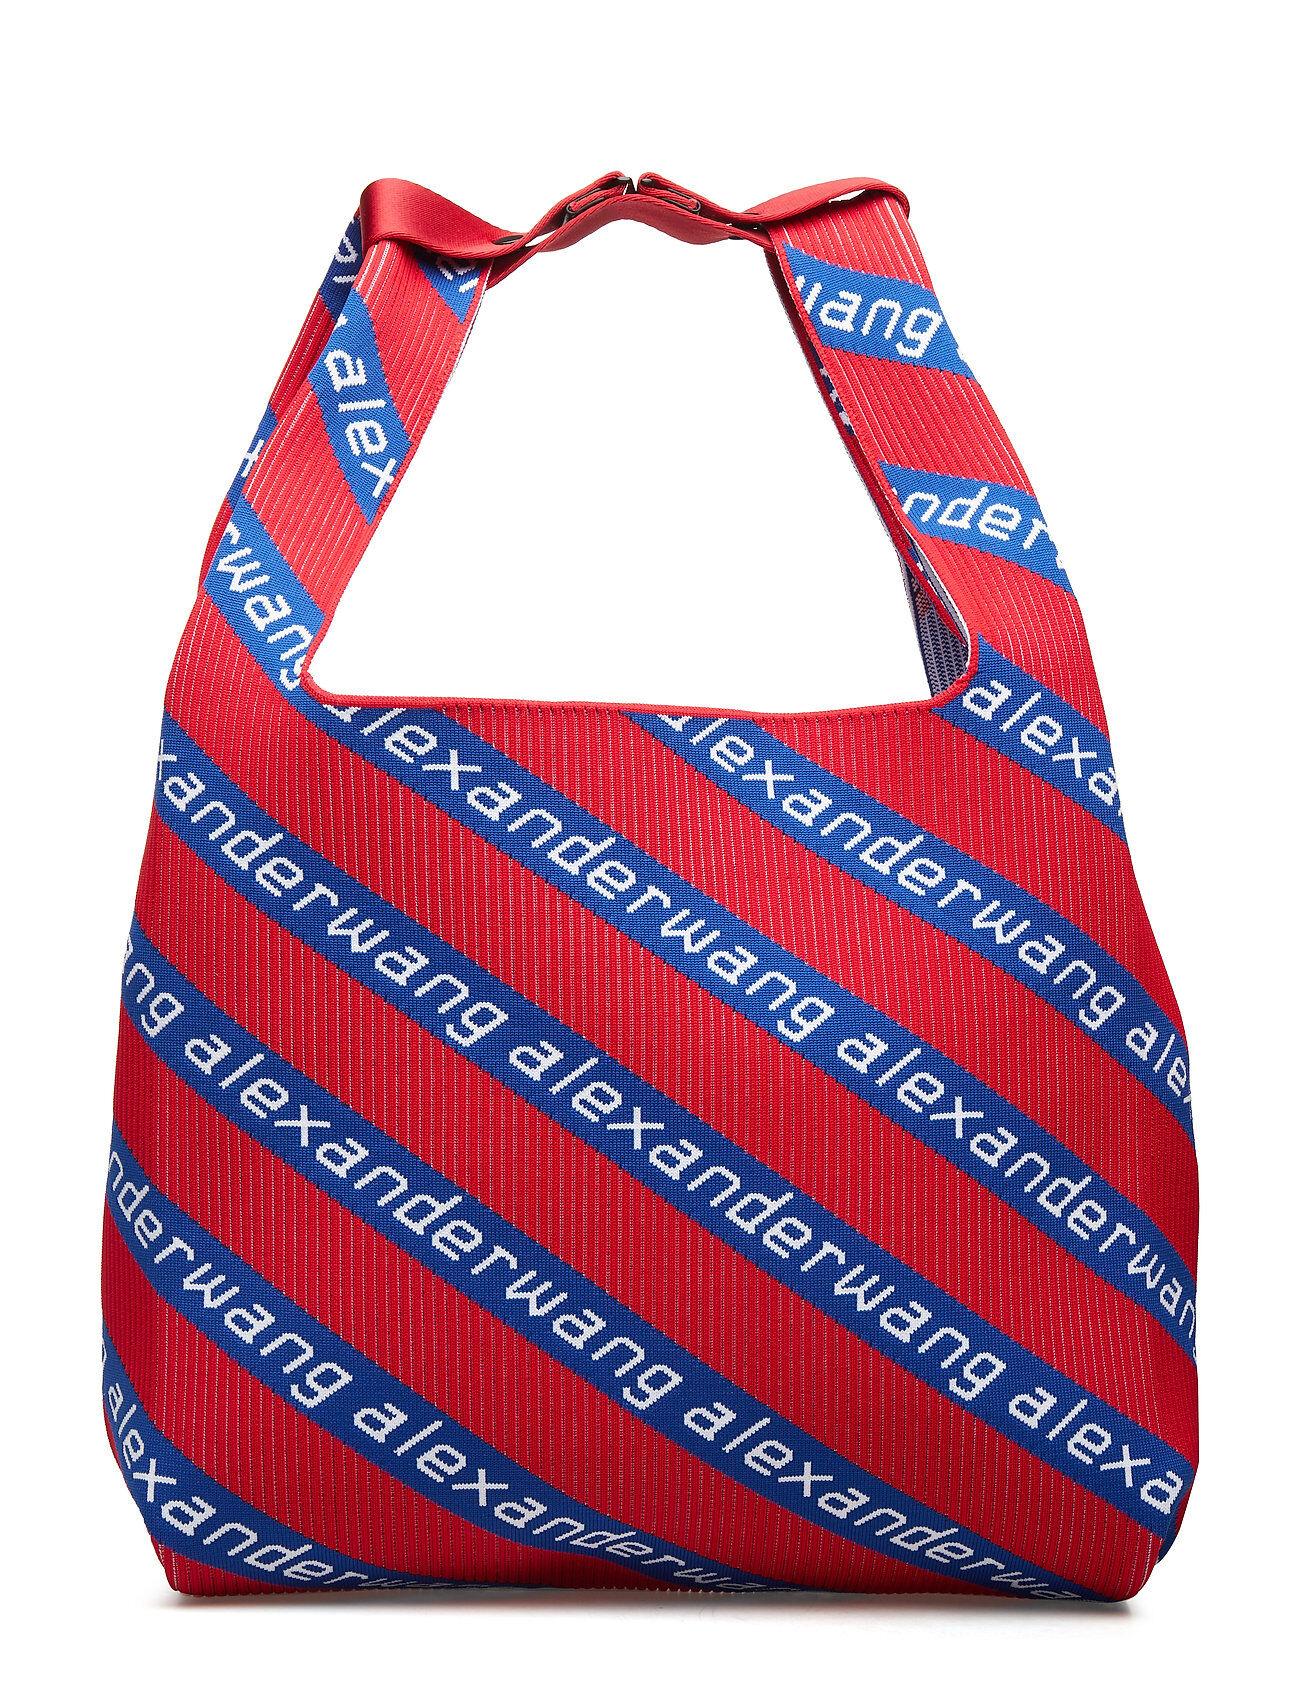 Alexander Wang Knit Jcqd Shopper In Americana Red/Wht/Blu Diagonal Logo